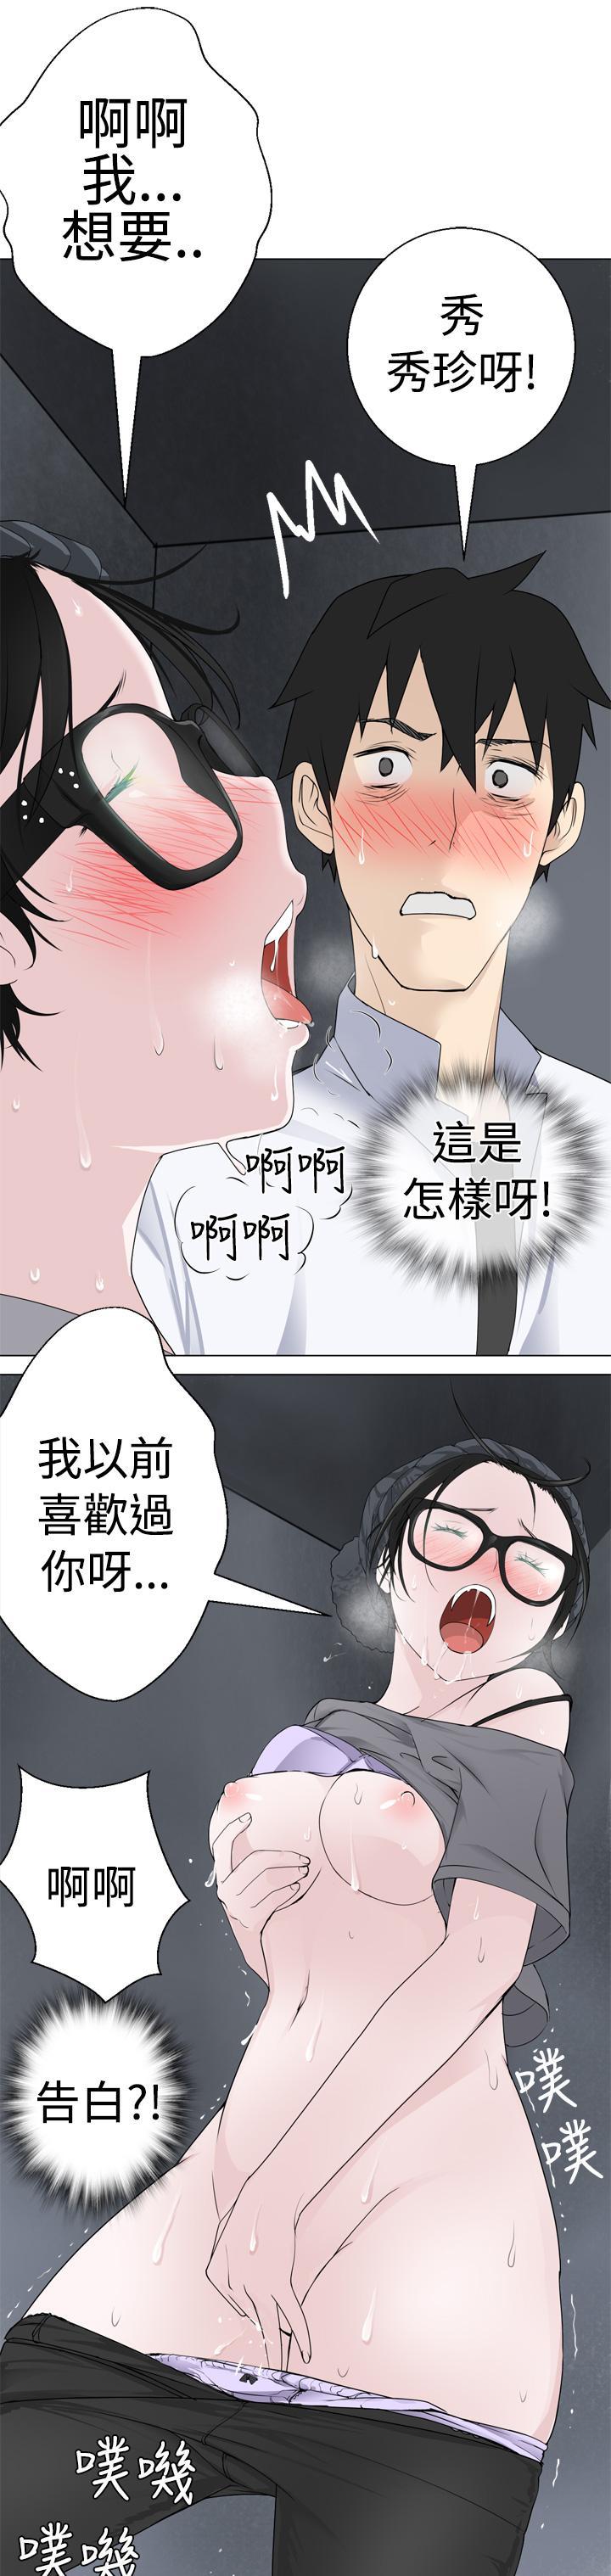 [SOSO] Franken Jo 为爱而生 法兰克赵 Ch.1~19 [Chinese]中文 129